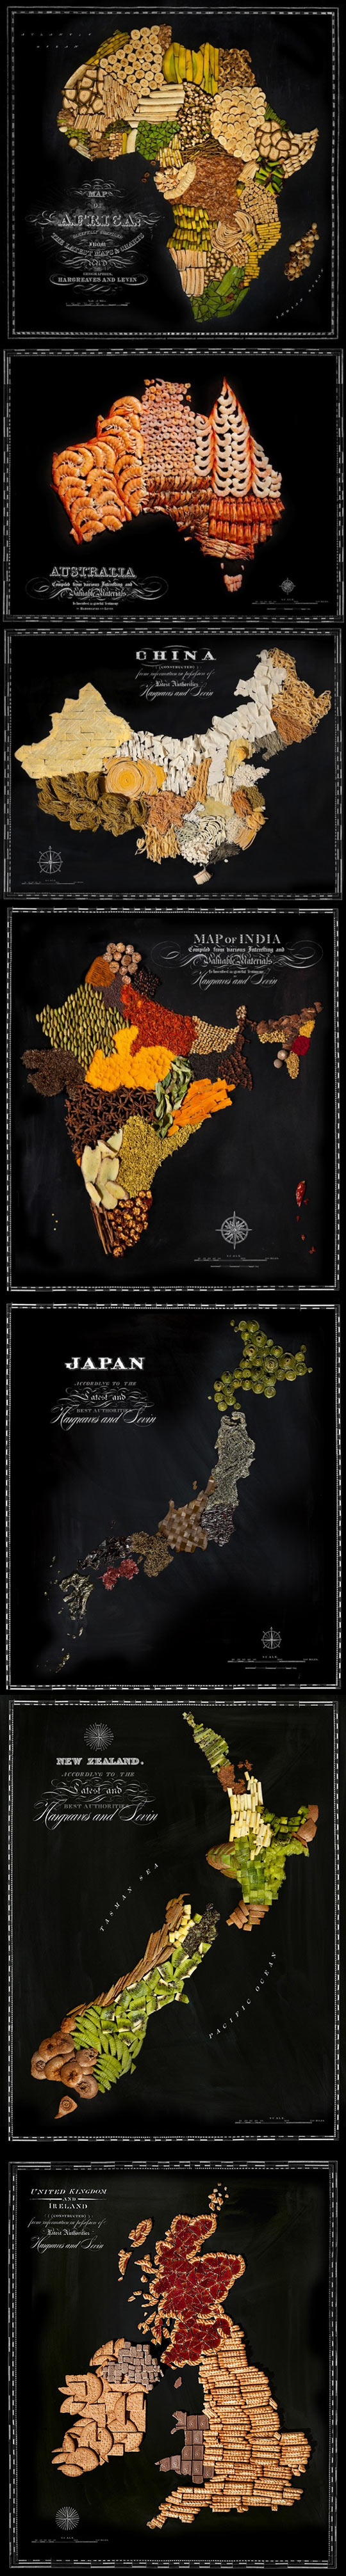 cool-delicious-maps-regional-food-America